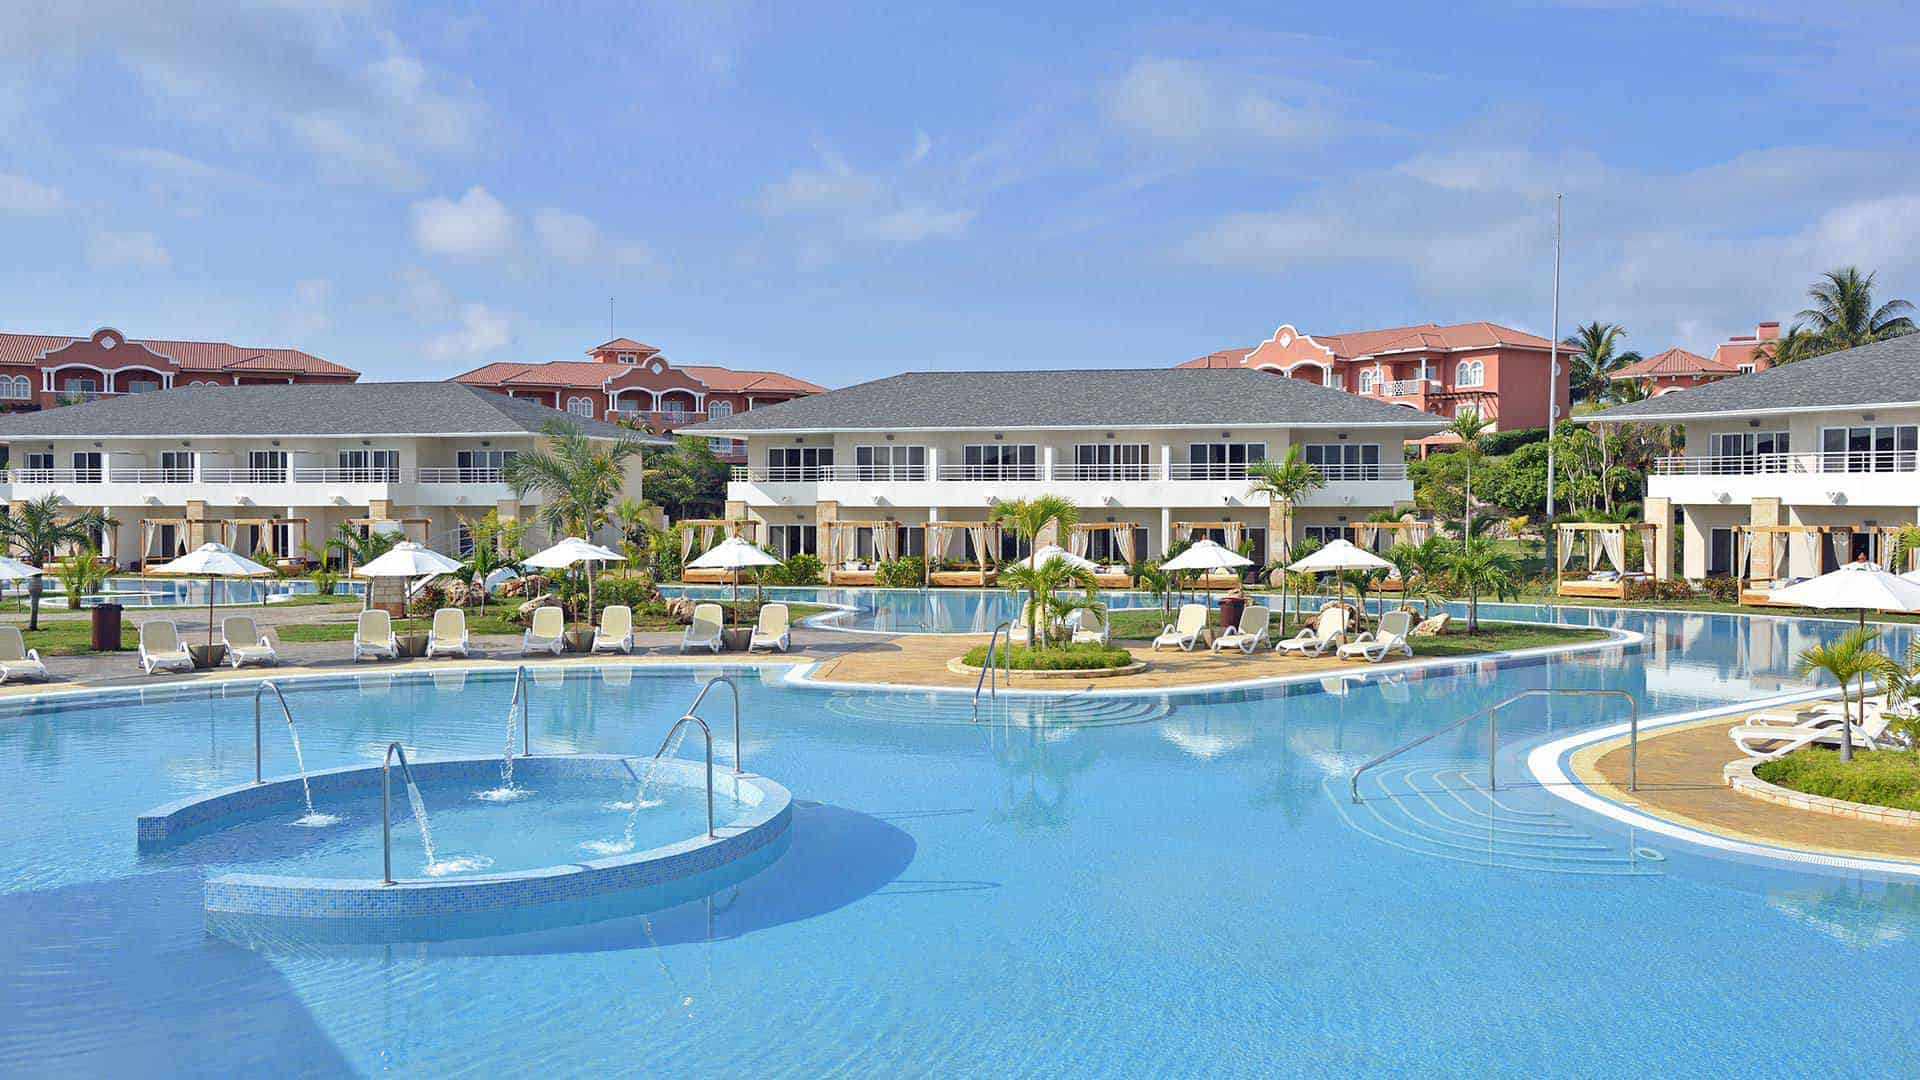 varadero hotel piscine cuba autrement 2